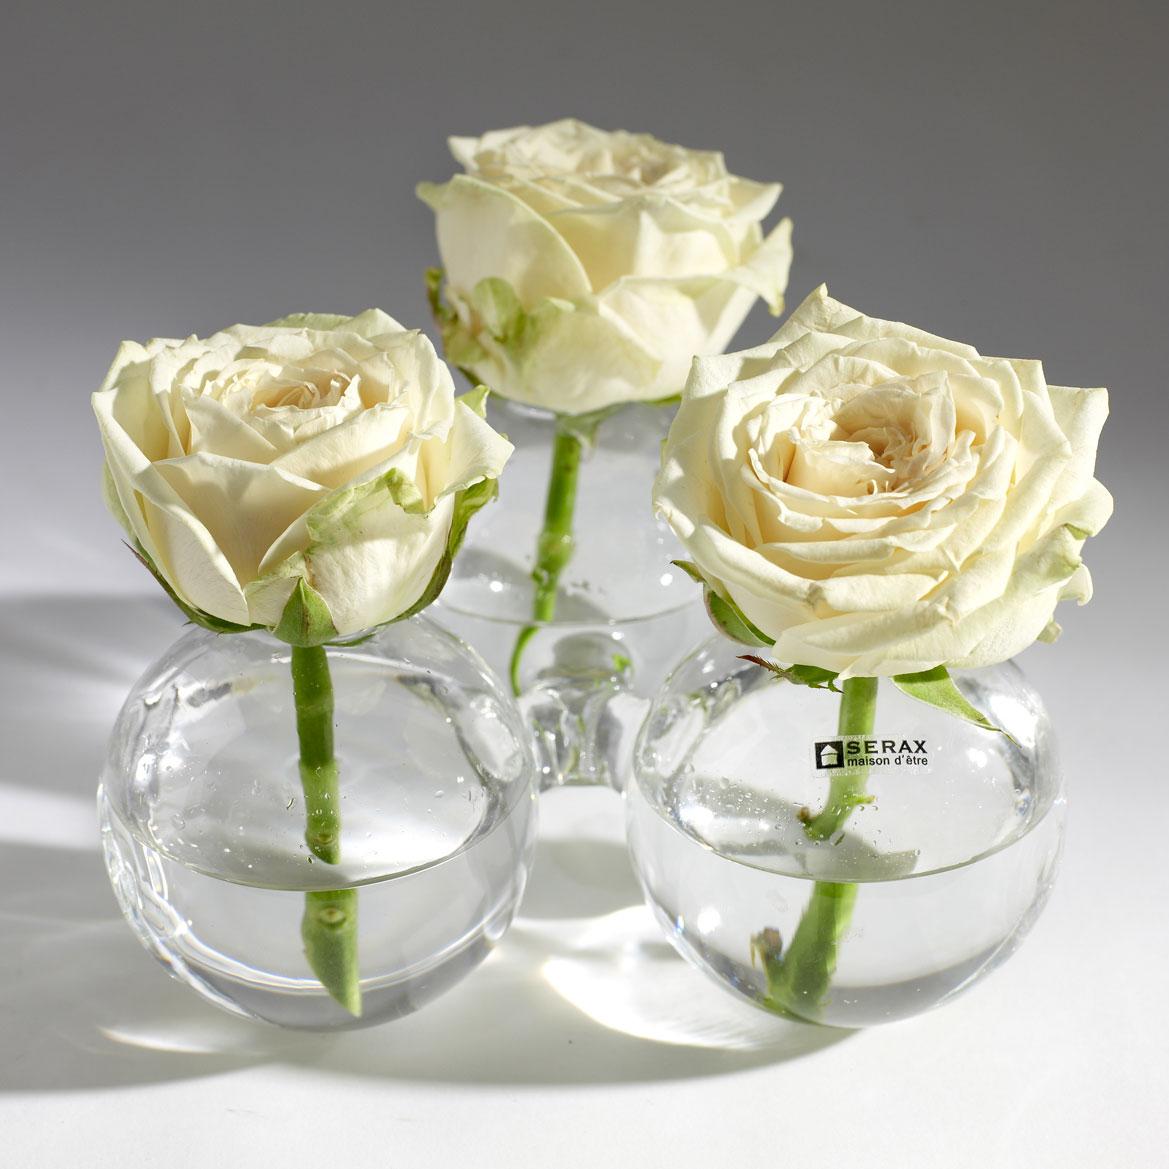 Les vases farandole serax guten morgwen - Vase mariage pas cher ...